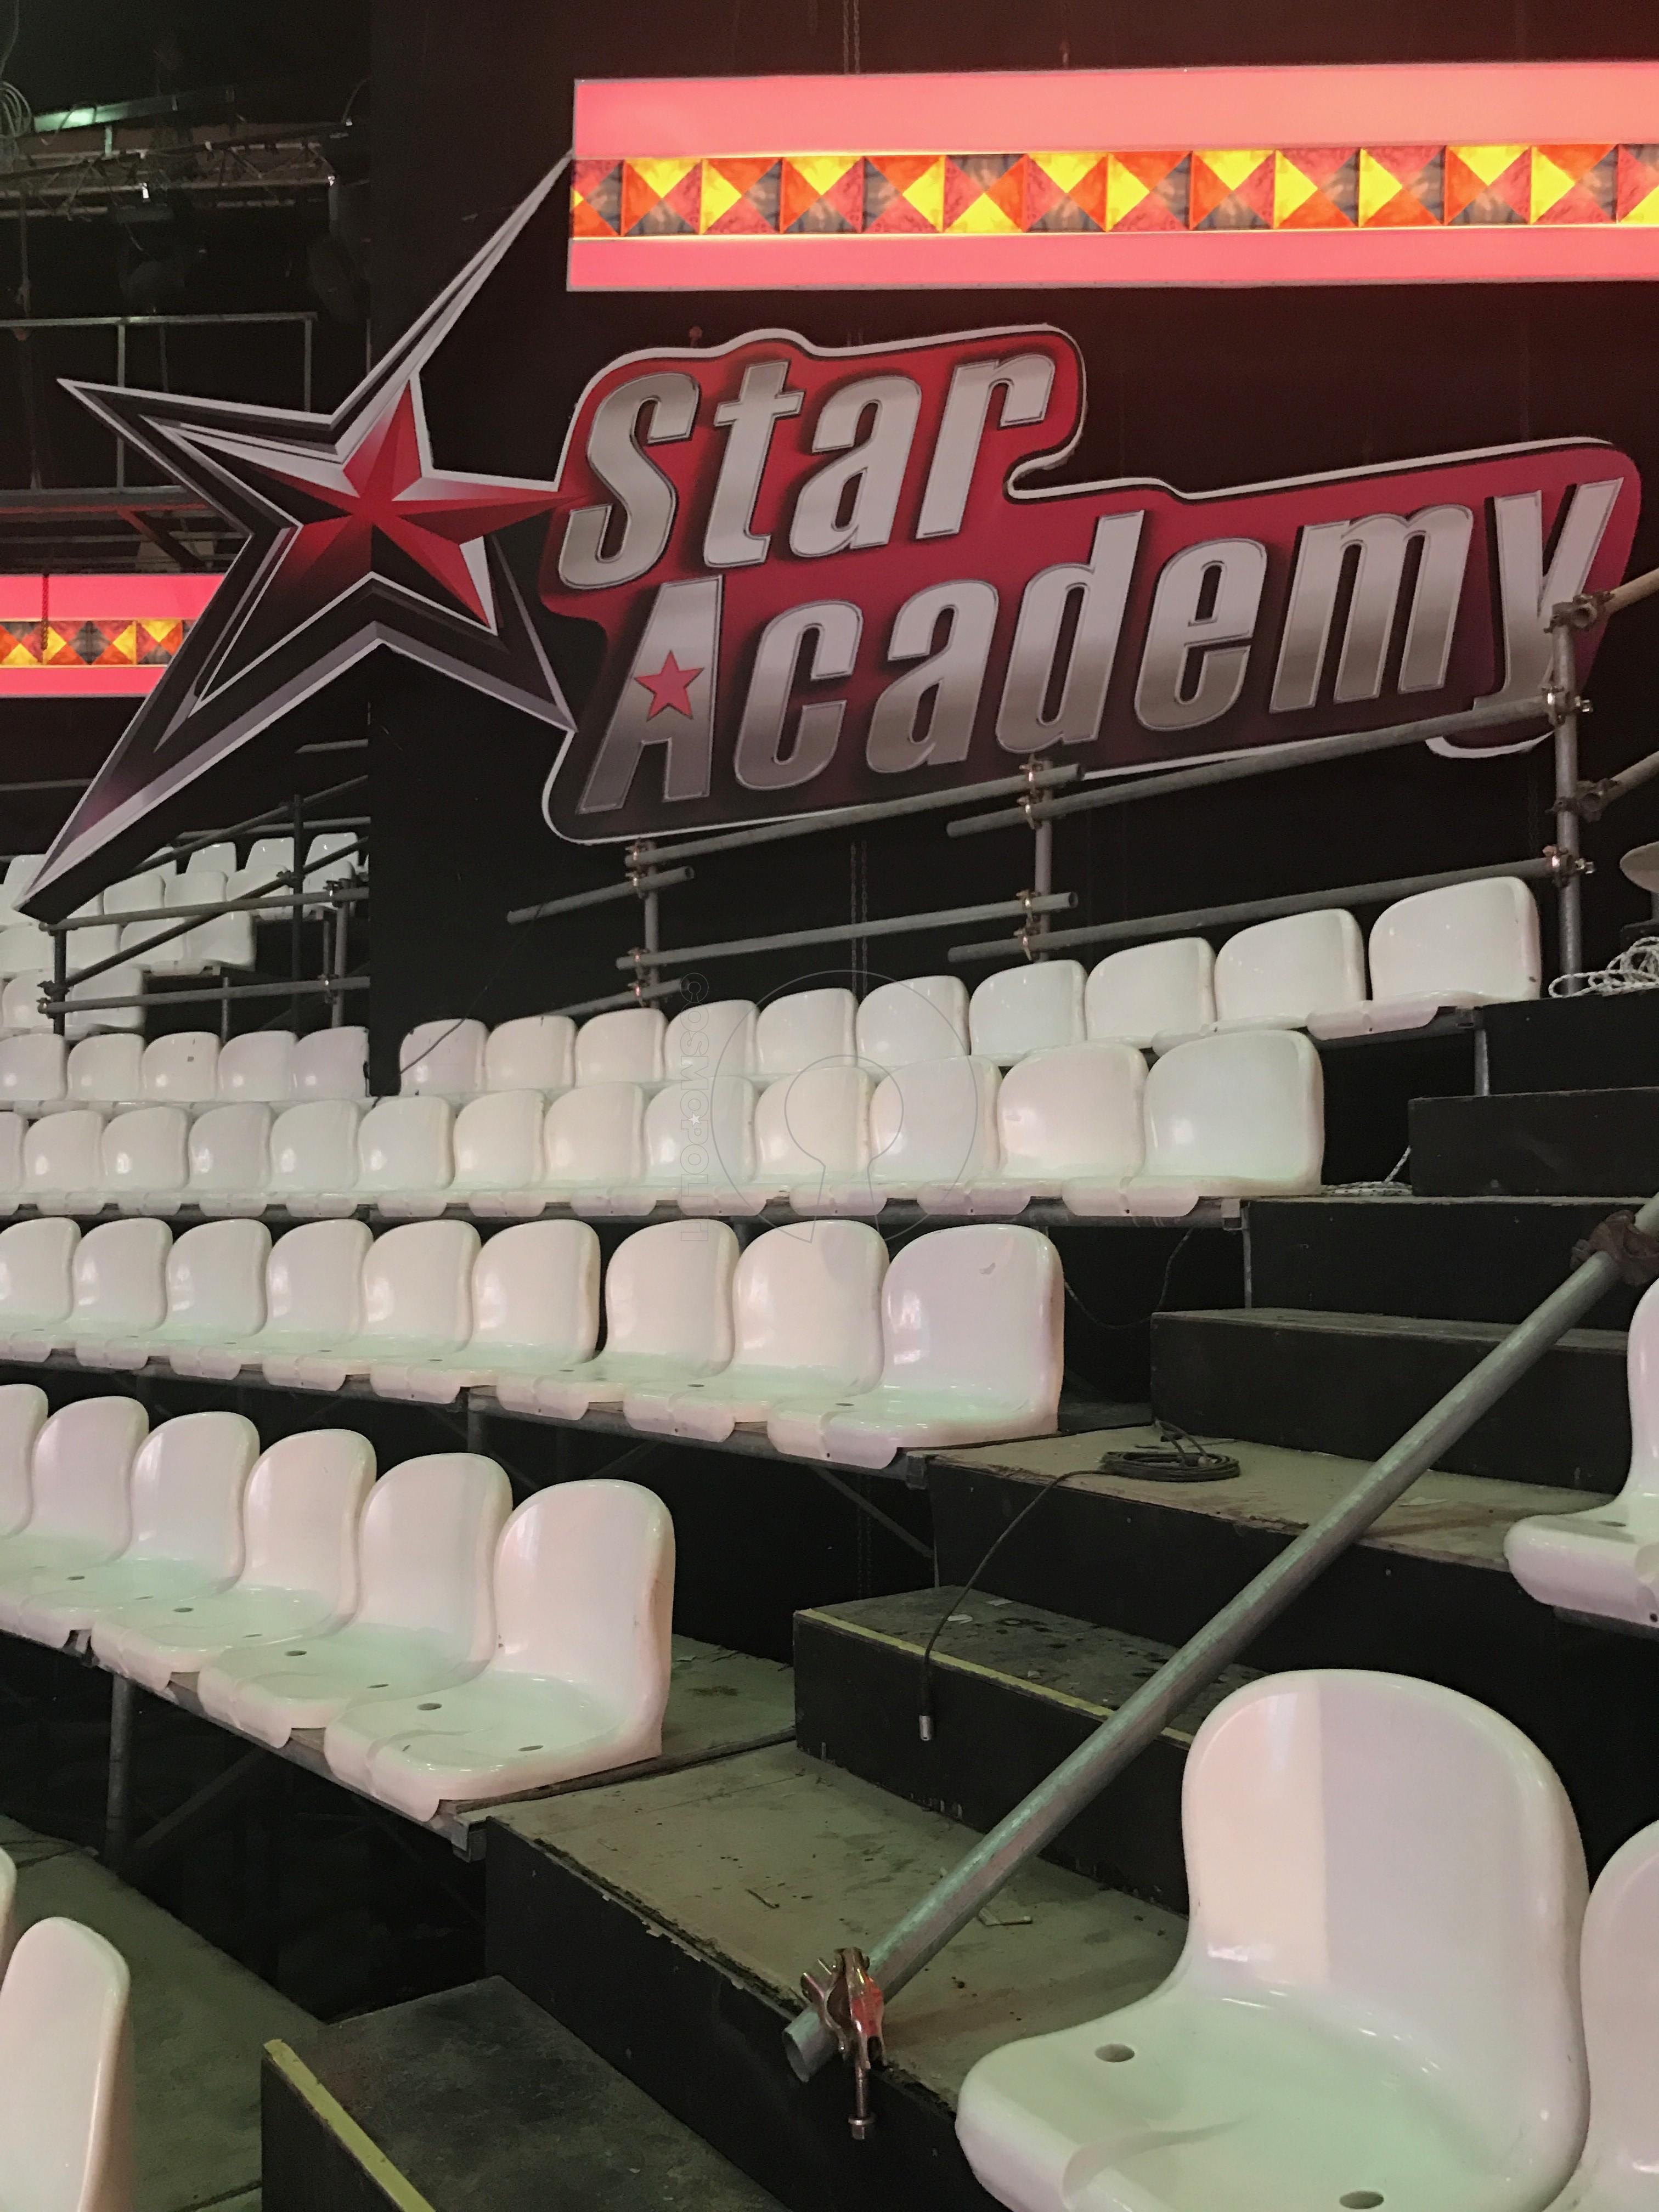 Sneak-pic of Star Academy studio